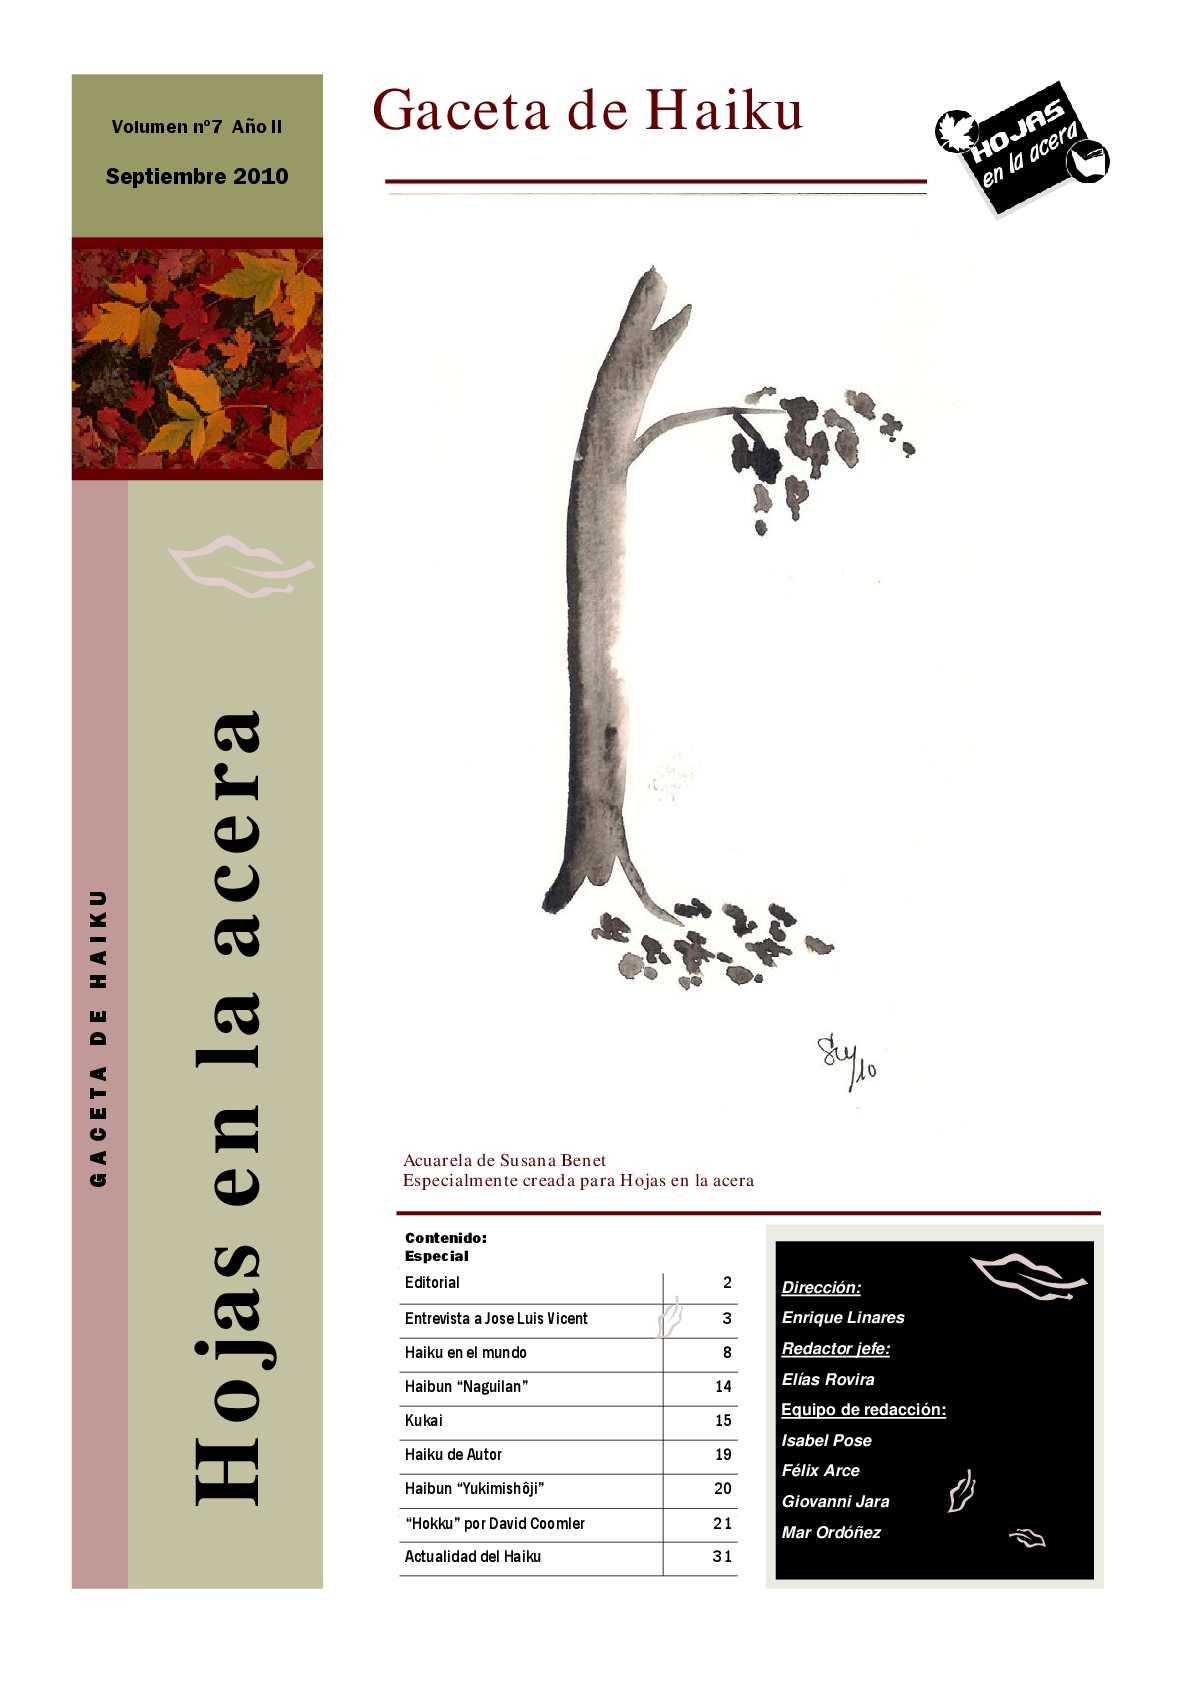 Calaméo - Hojas en la acera nº 7 Gaceta de Haiku